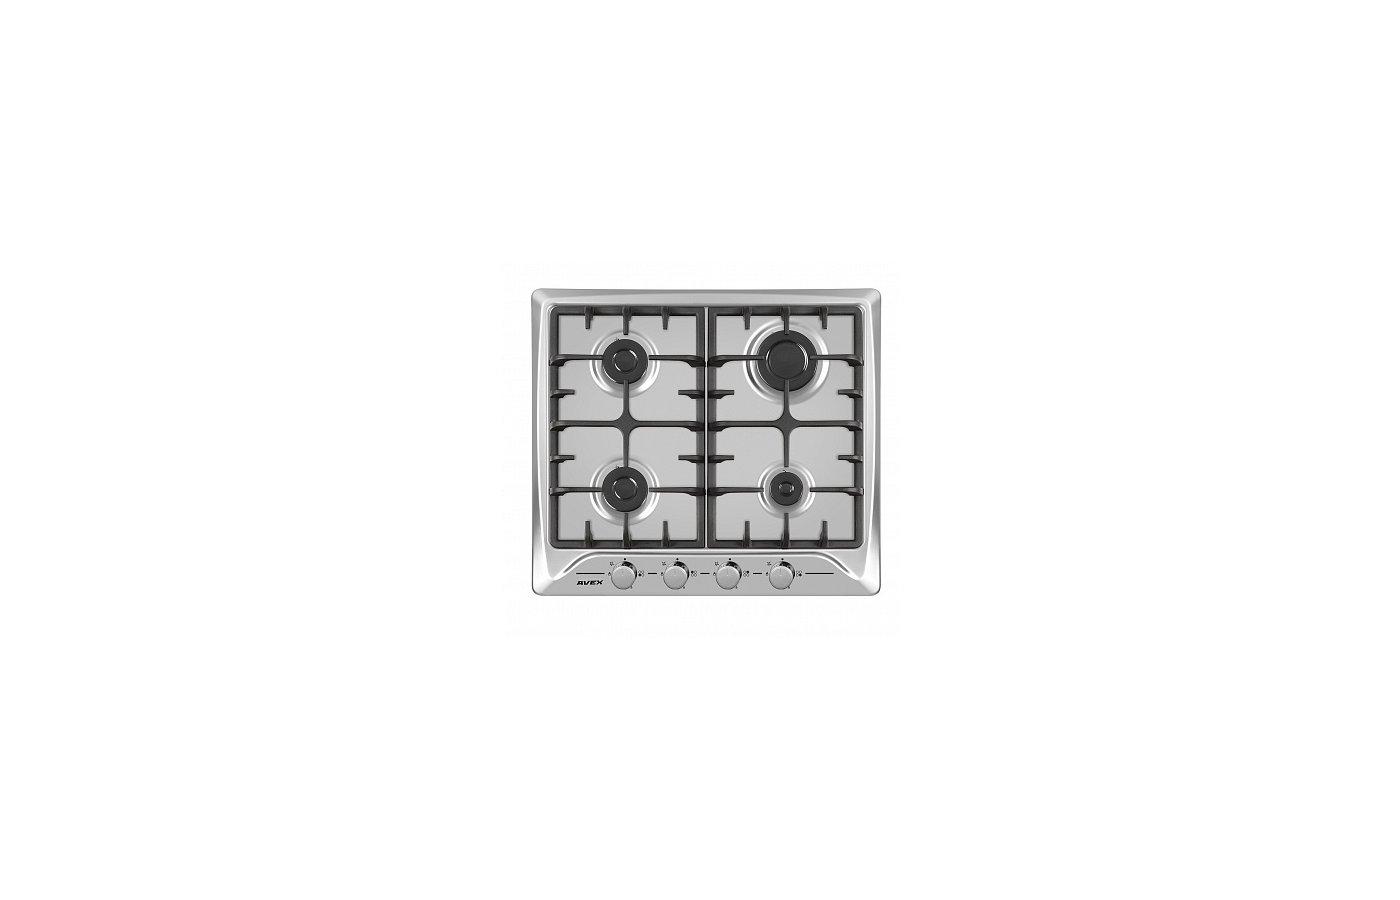 Варочная панель AVEX SX 6041